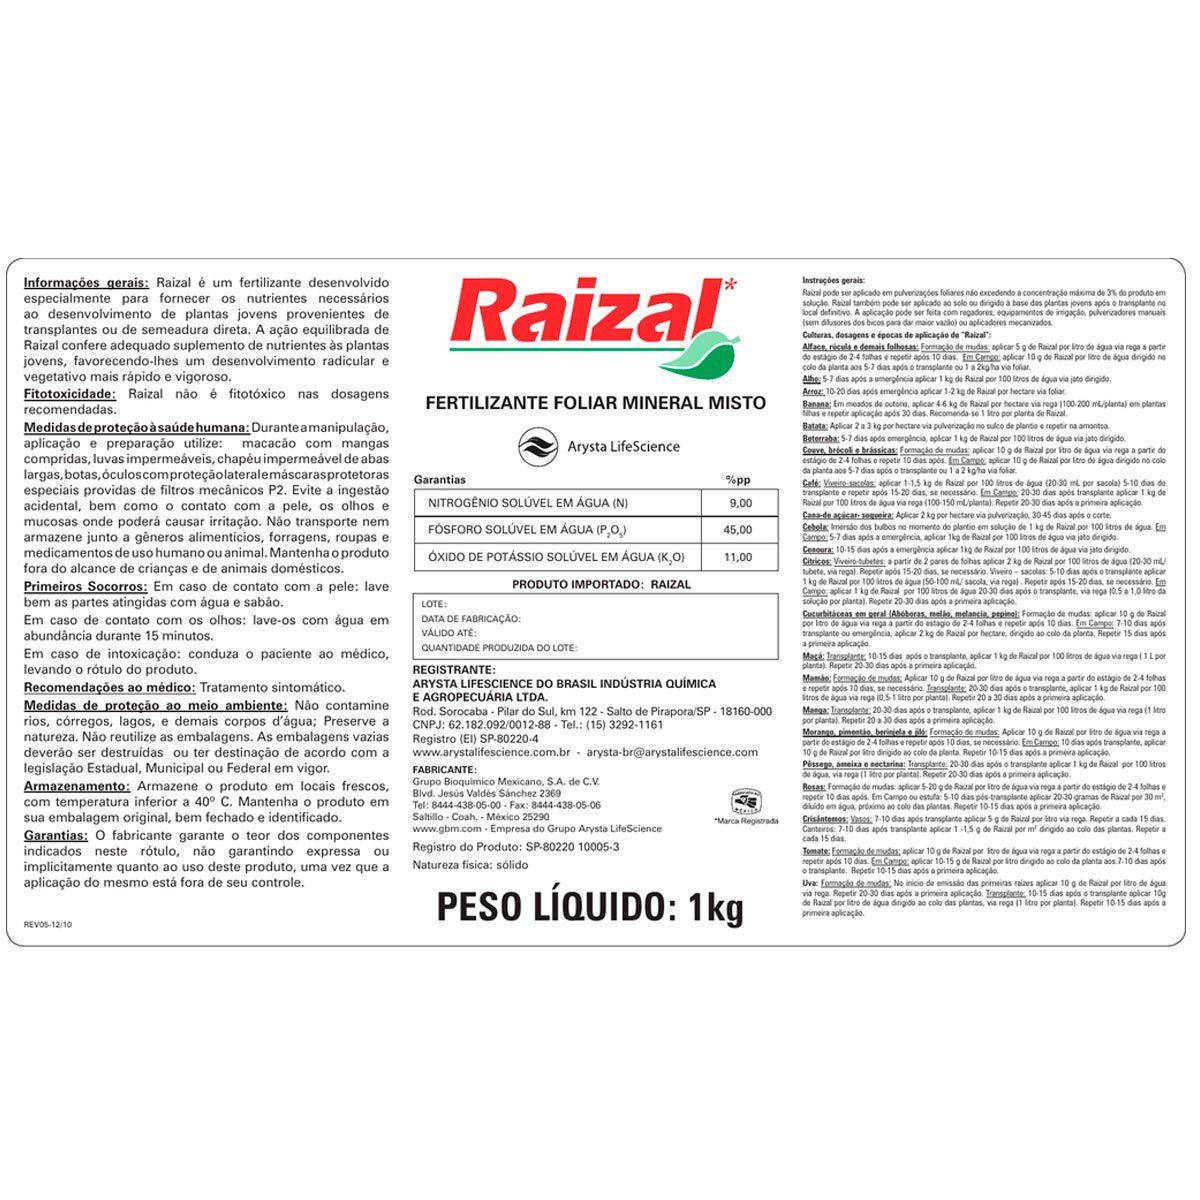 RAIZAL ARYSTA LIFESCIENCE - FERTILIZANTE FOLIAR MINERAL MISTO